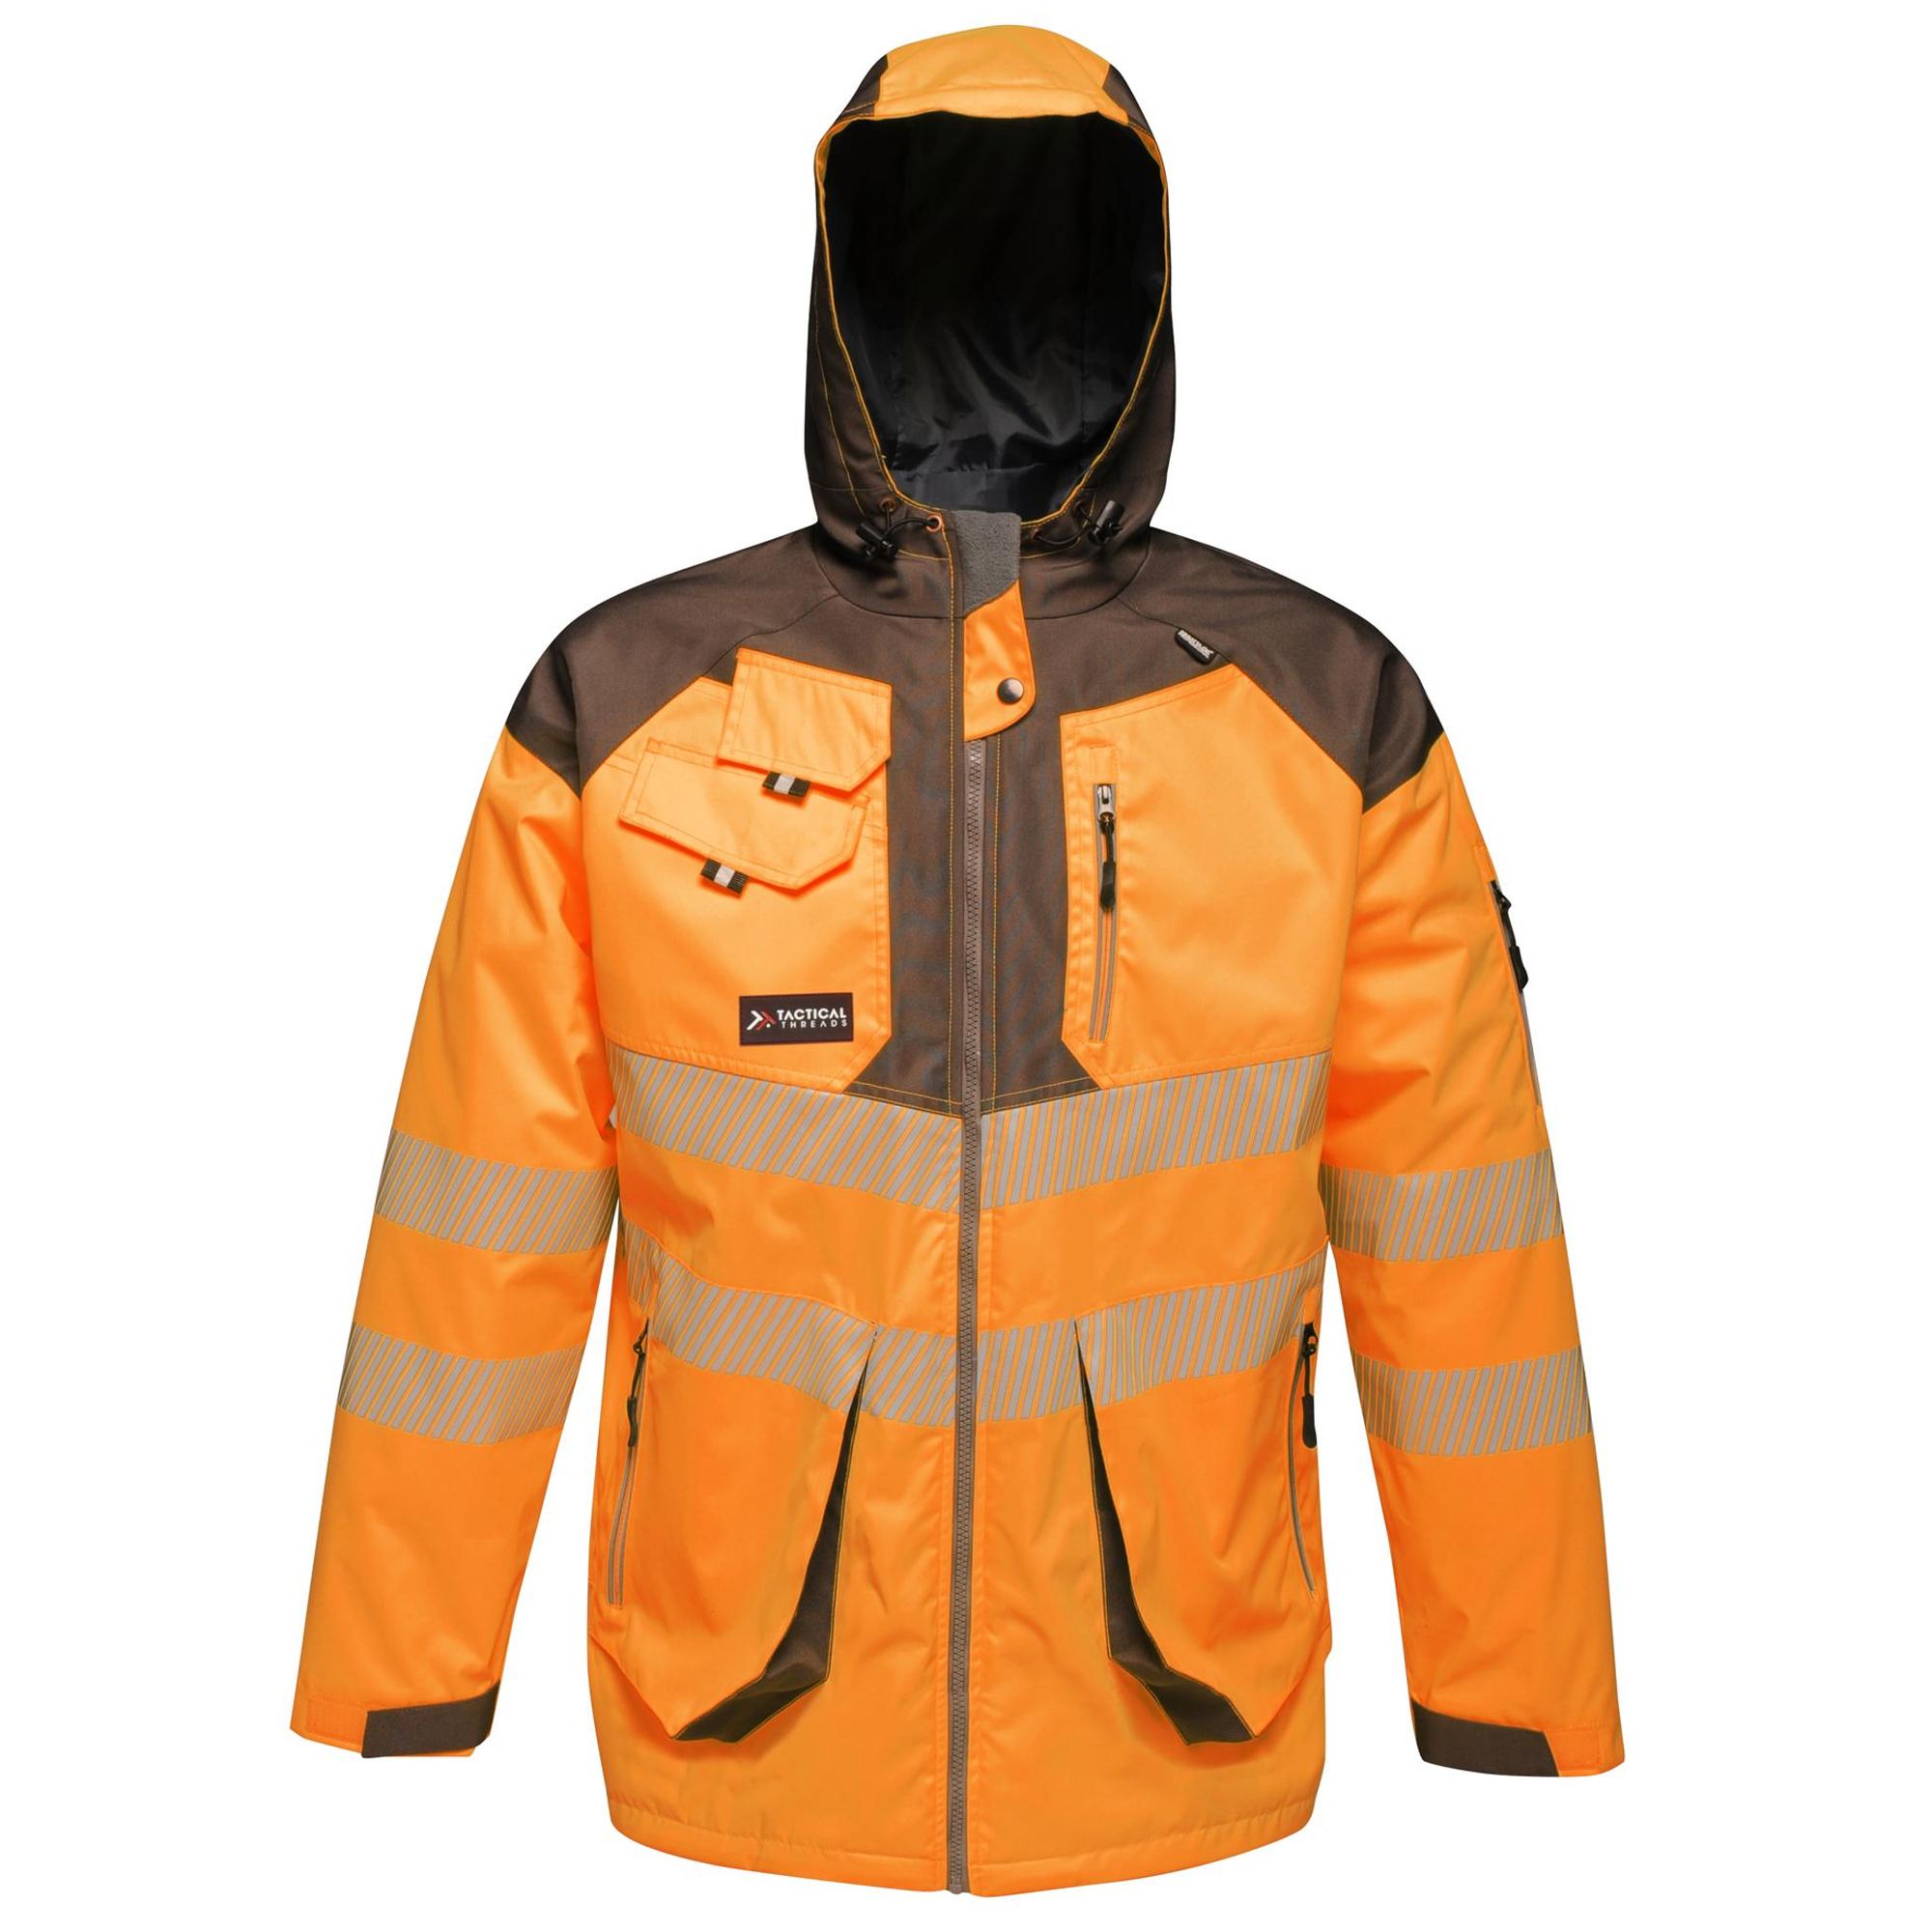 Regatta Mens Hi-Vis Waterproof Reflective Parka Jacket (S) (Orange/Grey)